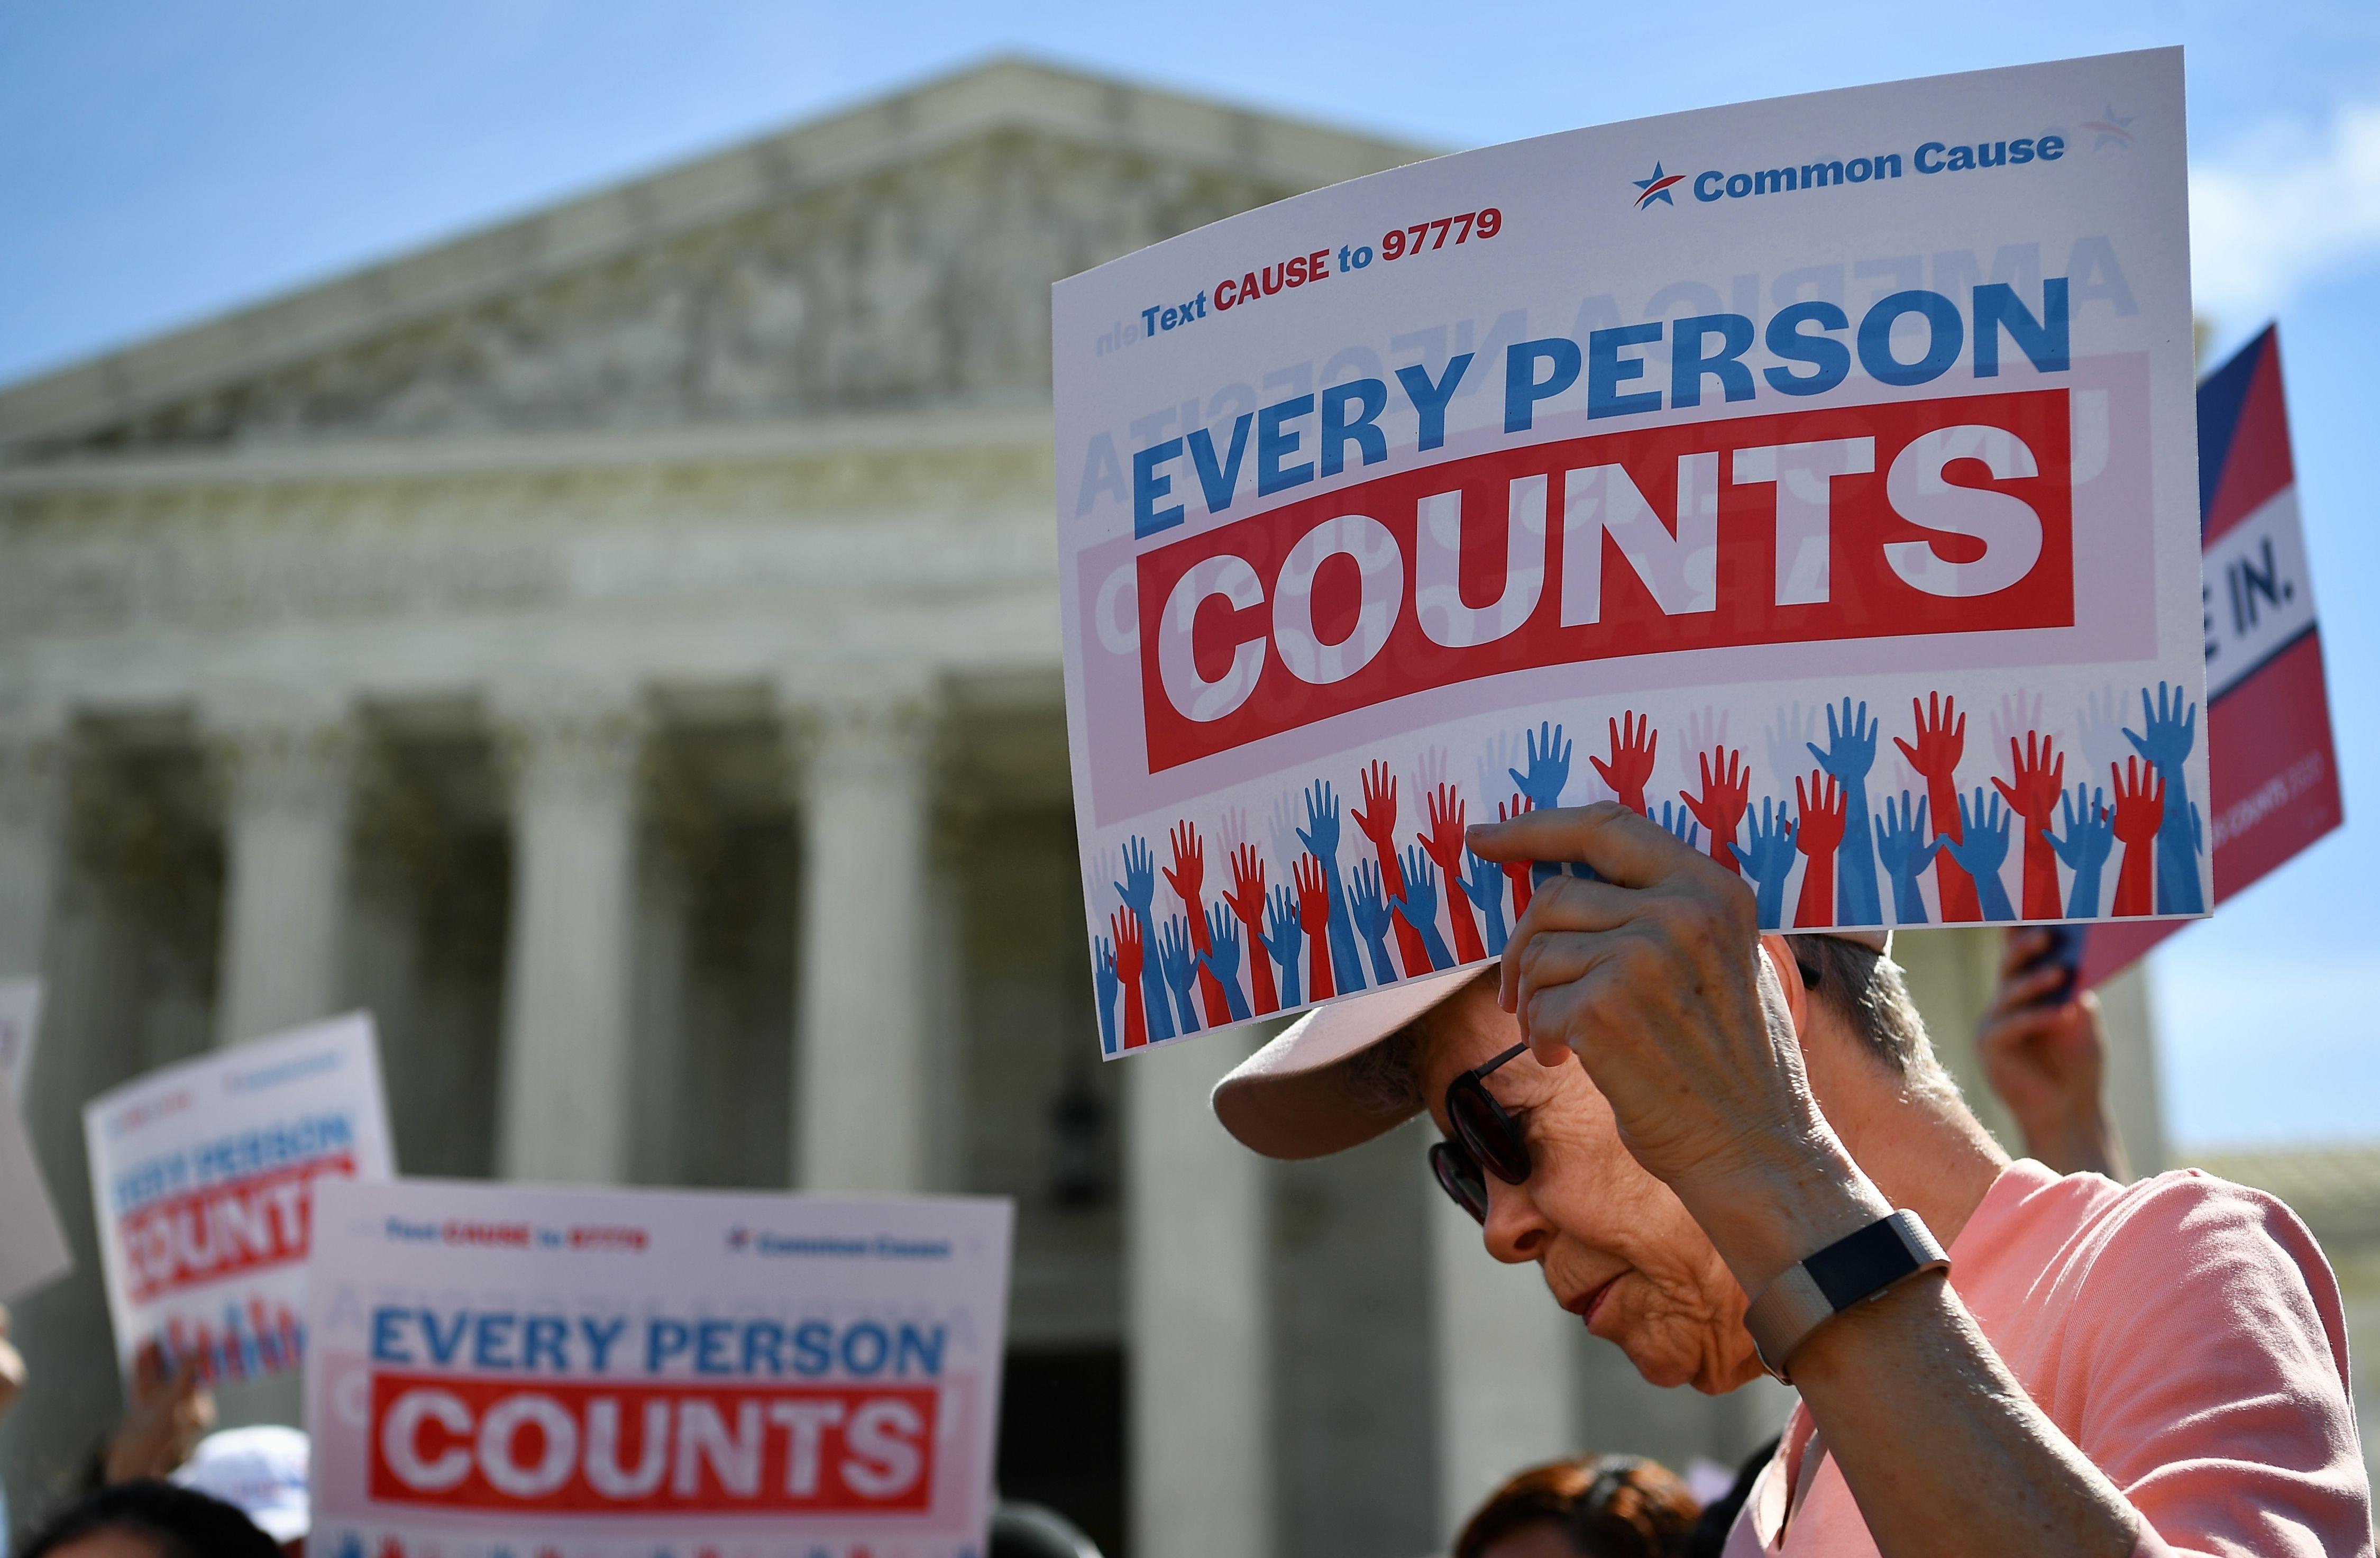 Demonstrators rally at the Supreme Court on April 23, 2019. (Mandel Ngan/AFP/Getty Images)